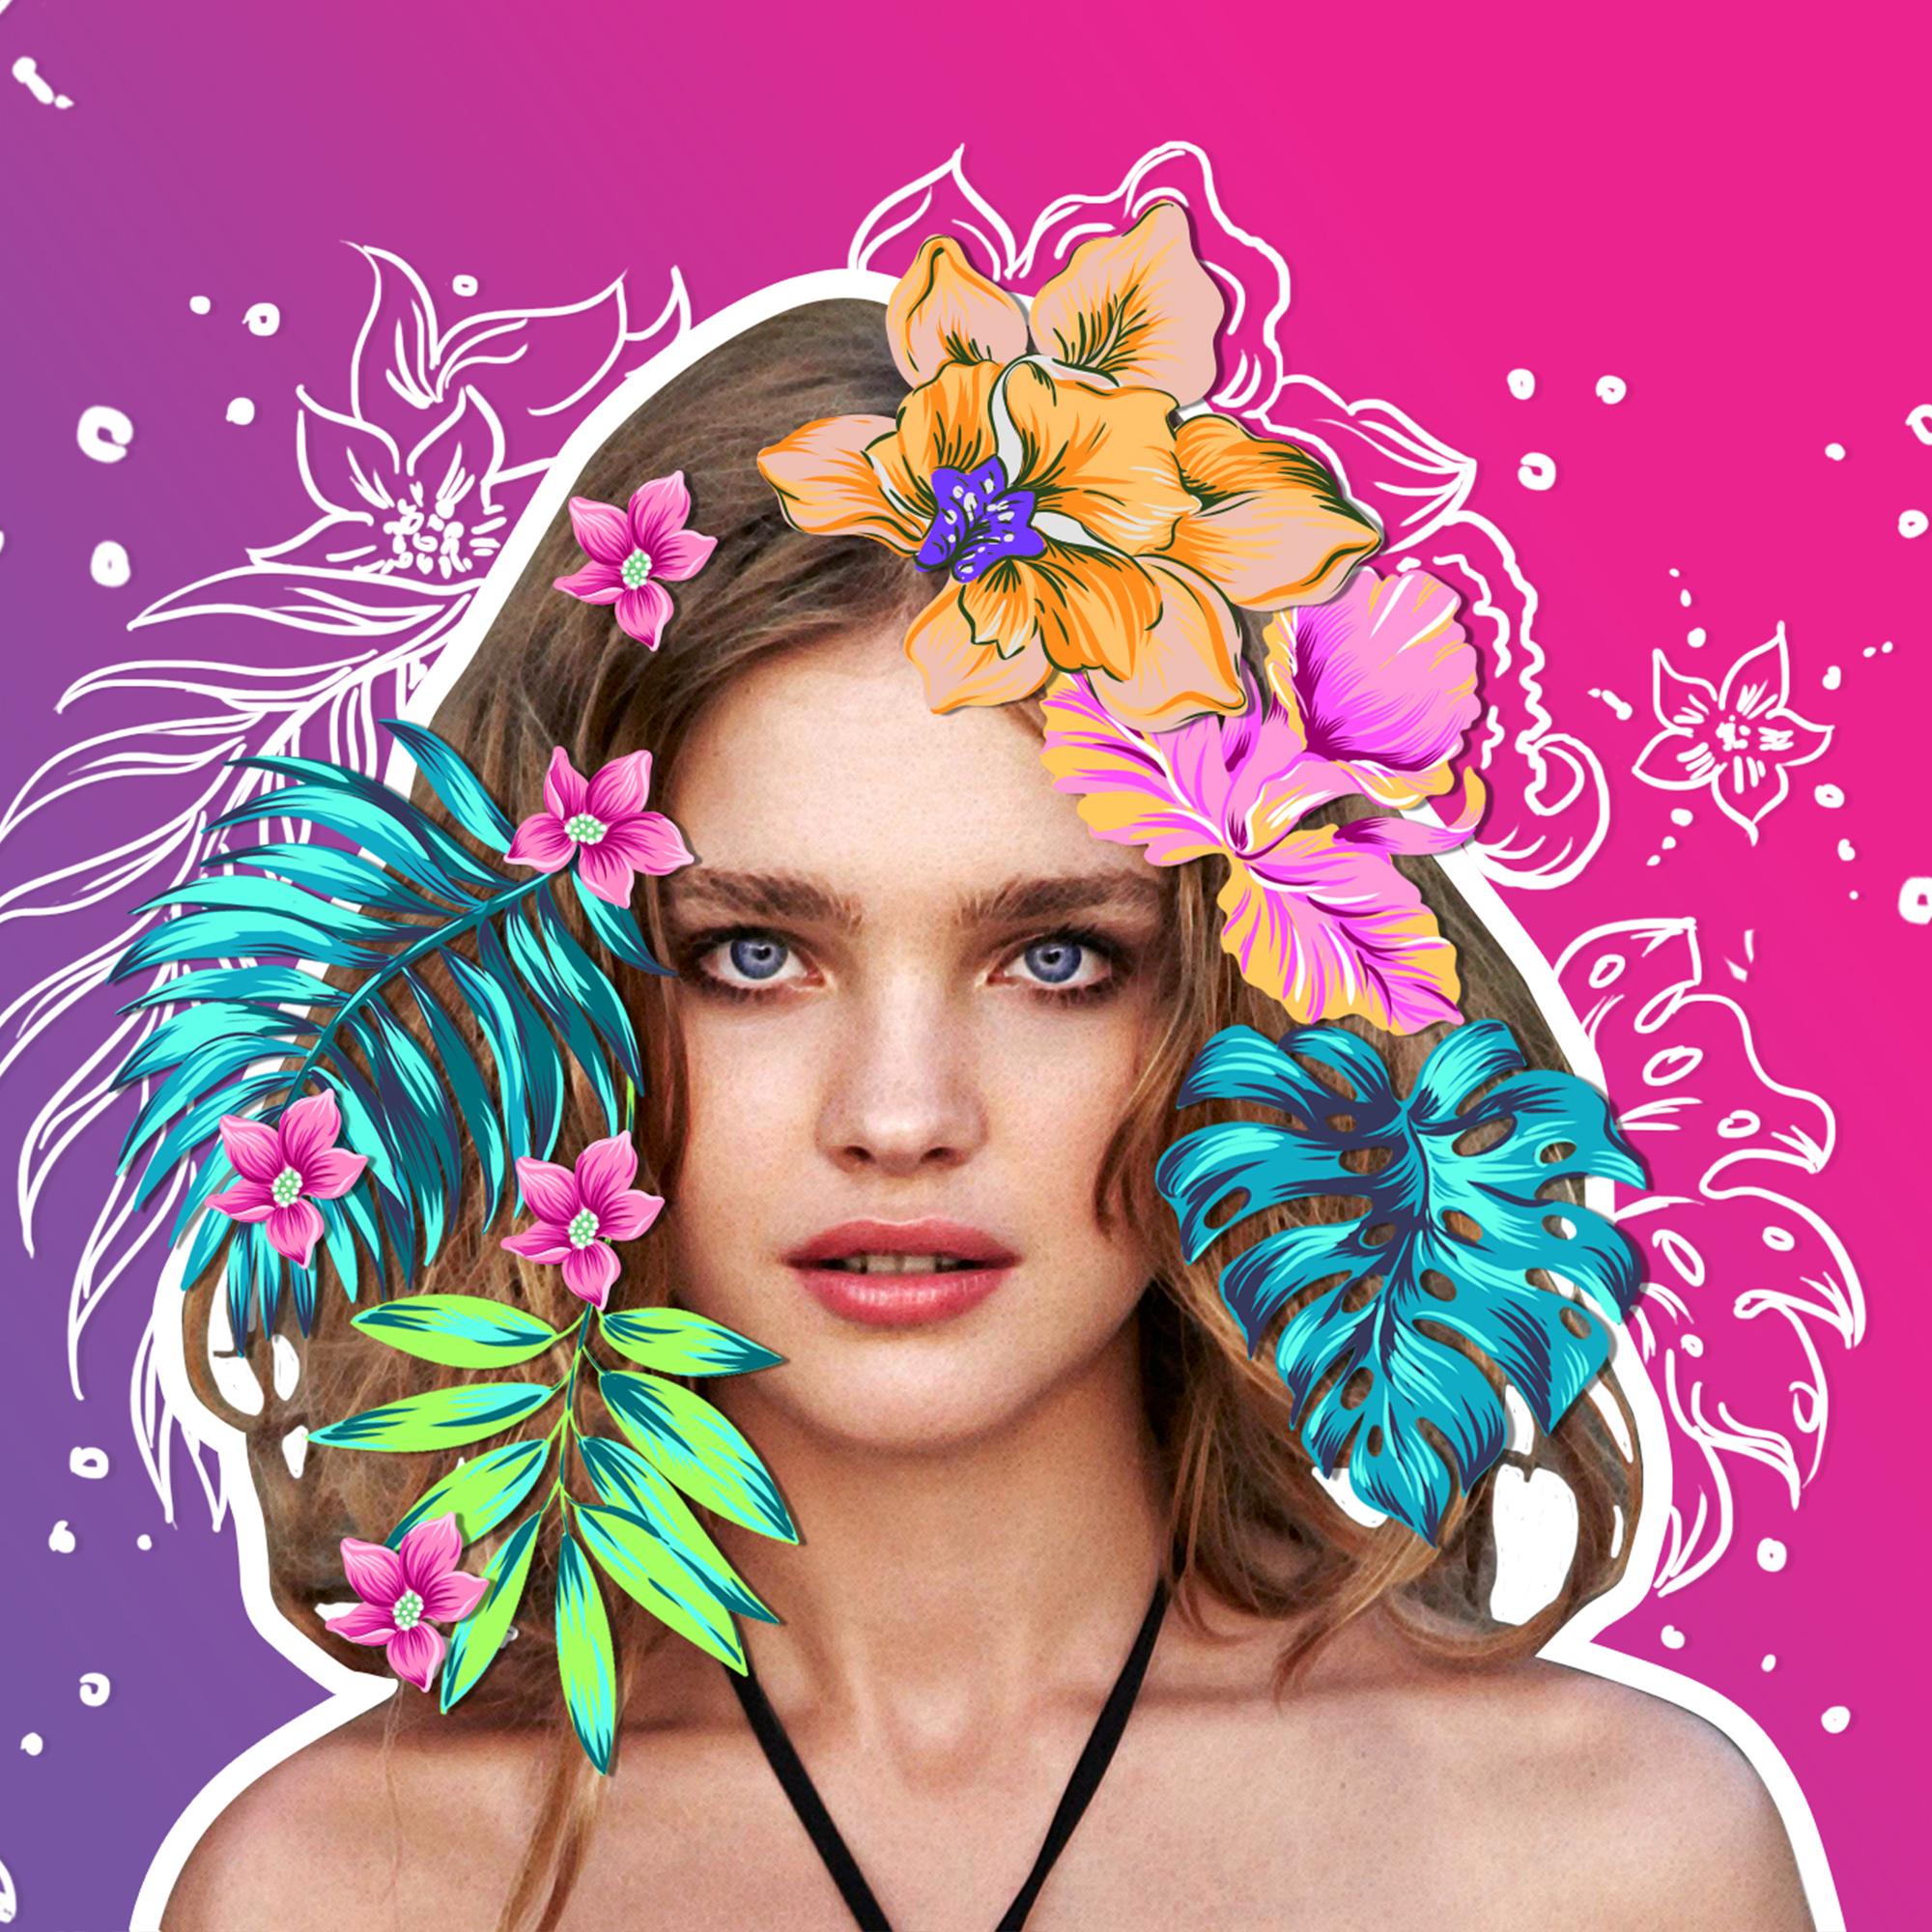 Supermodel and philanthropist Natalia Vodianova Joins PicsArt Team as Head of Aspiration